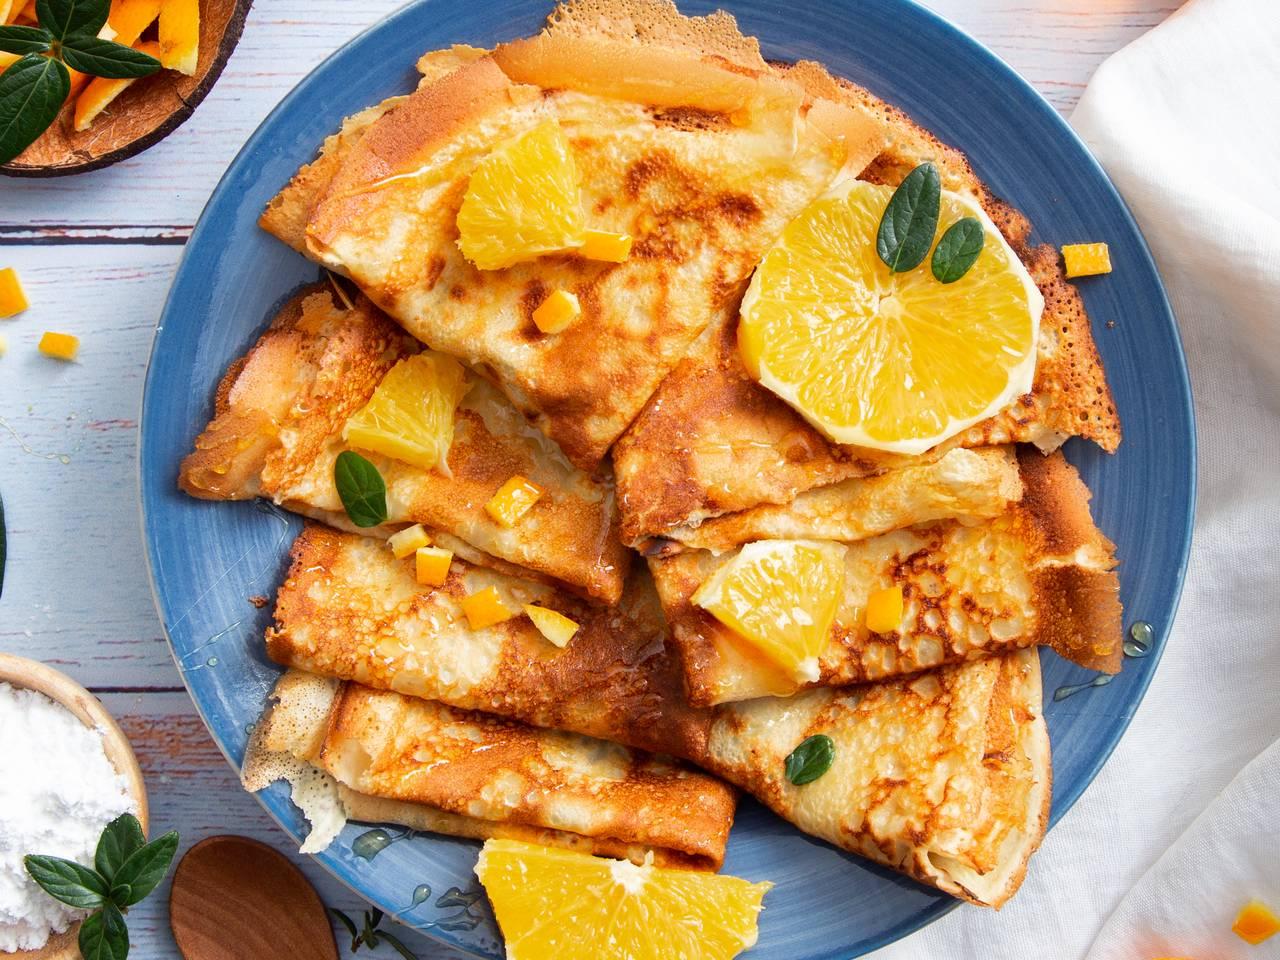 Crepe with honey and orange